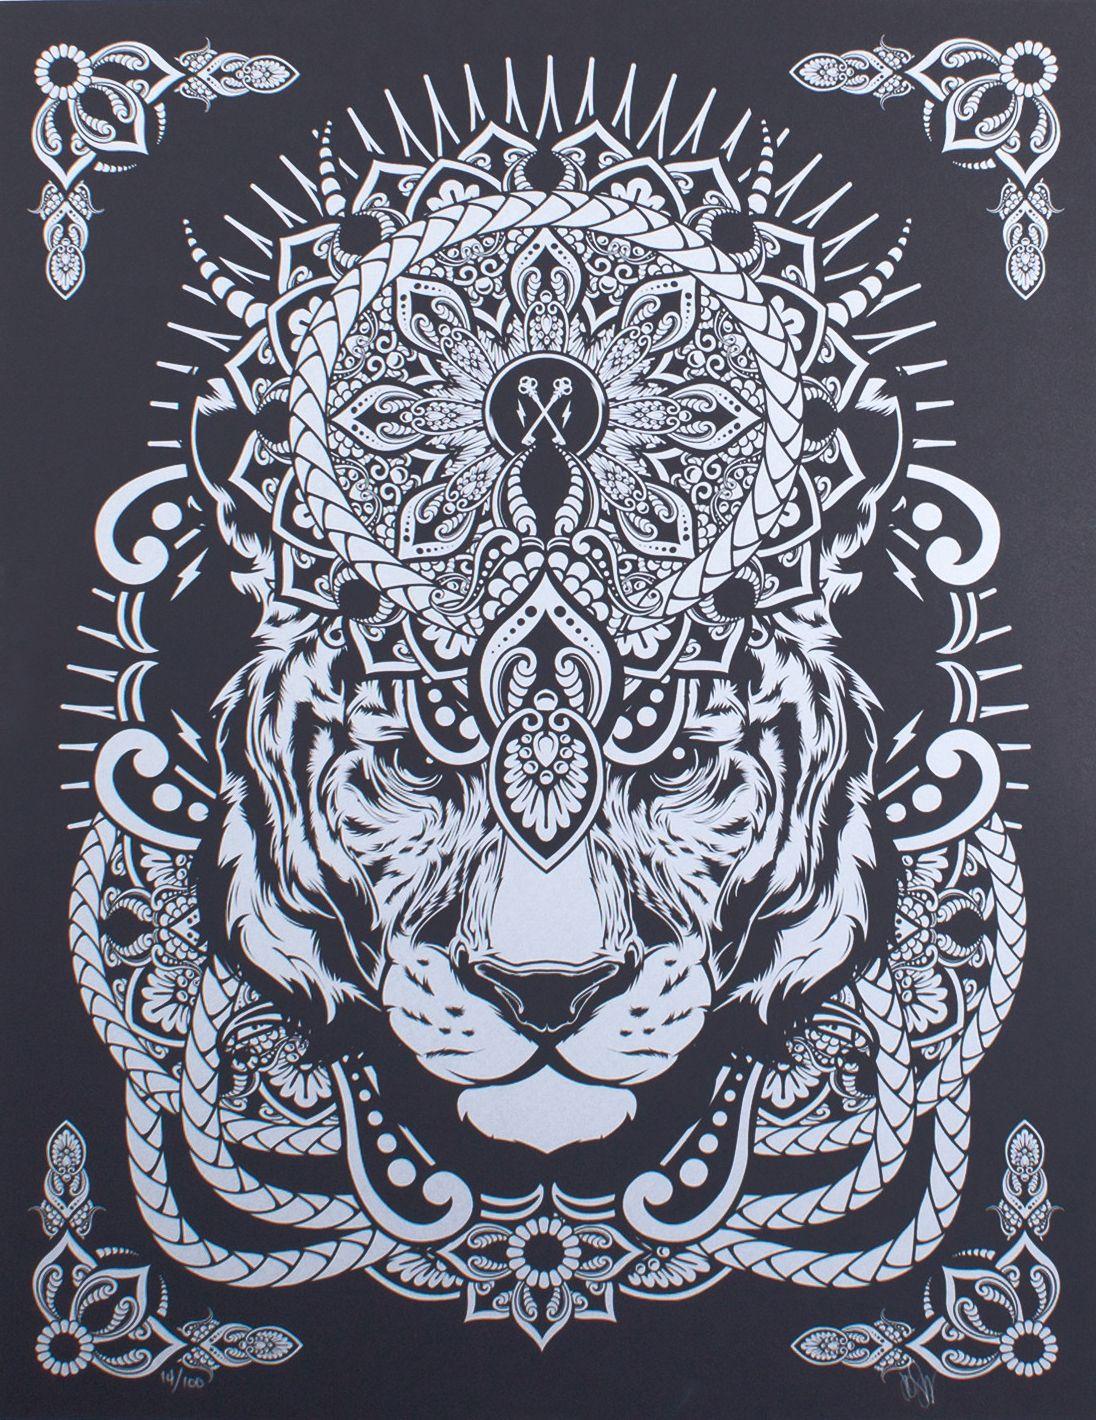 Mandala tiger screenprint by hydro74 trampt library tatoos pinterest mandala tigers and - Tigre mandala ...